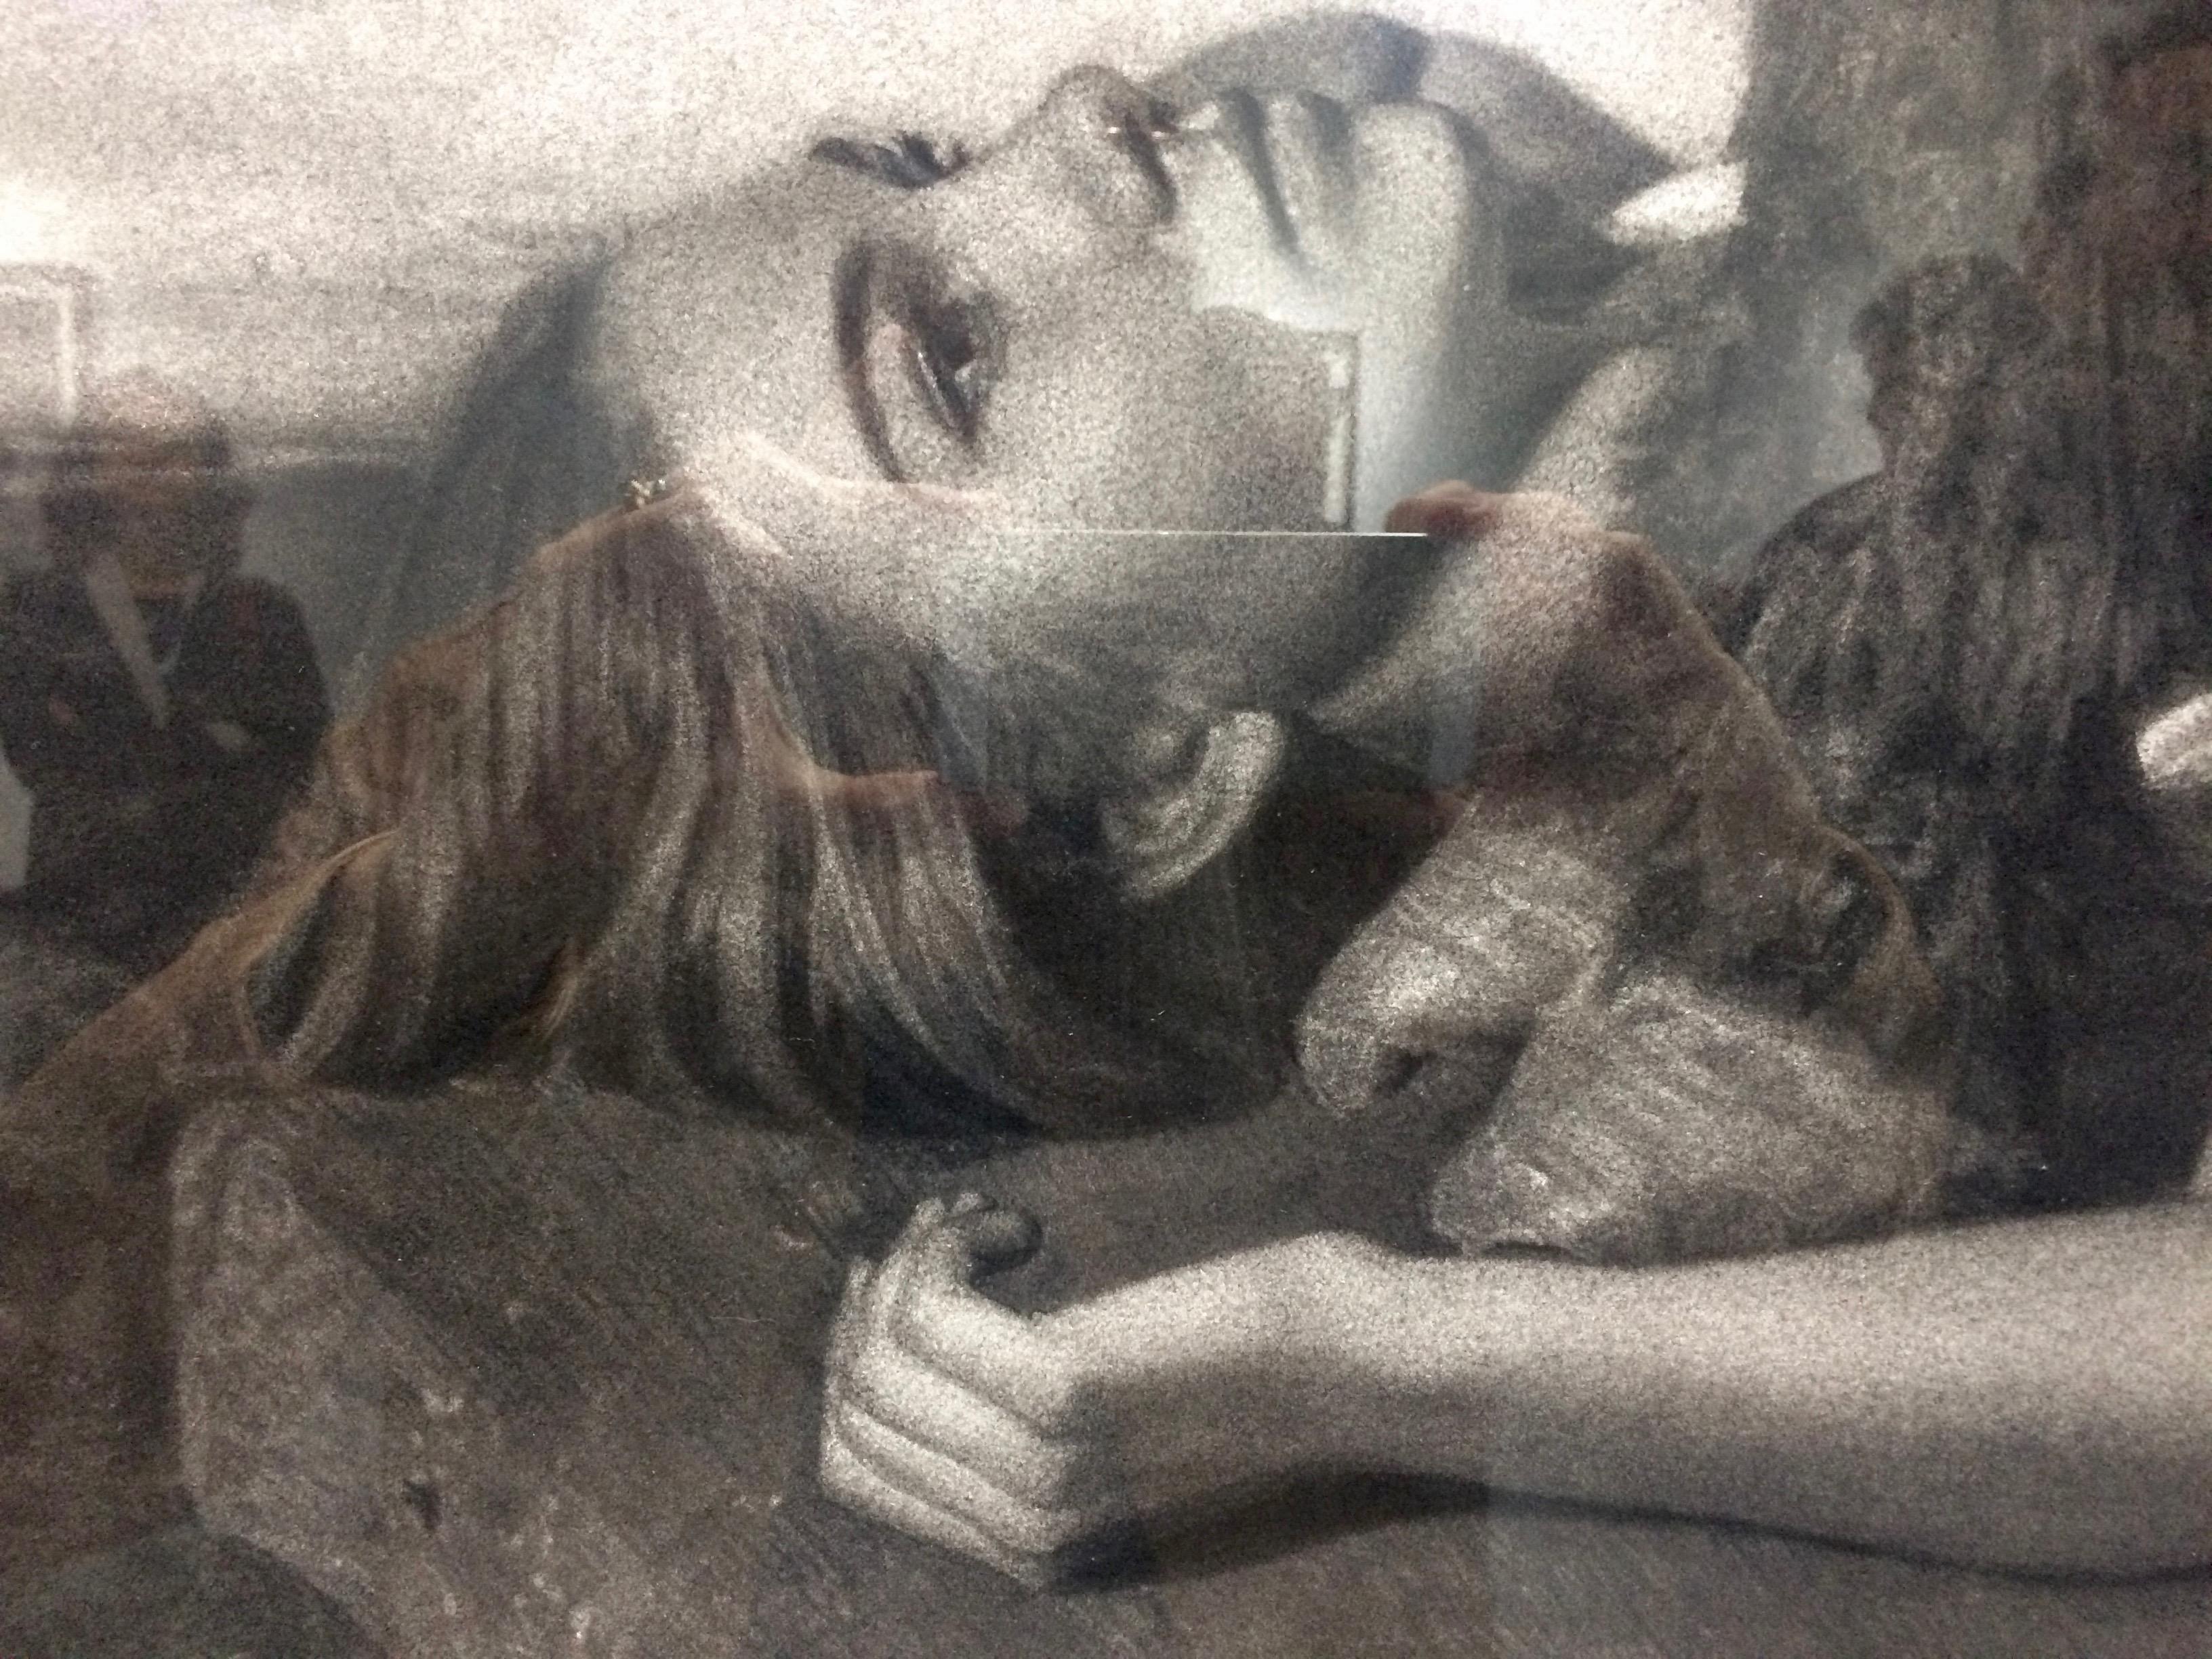 Annie Murphy Robinson Exhibit | Pastimes for a Lifetime